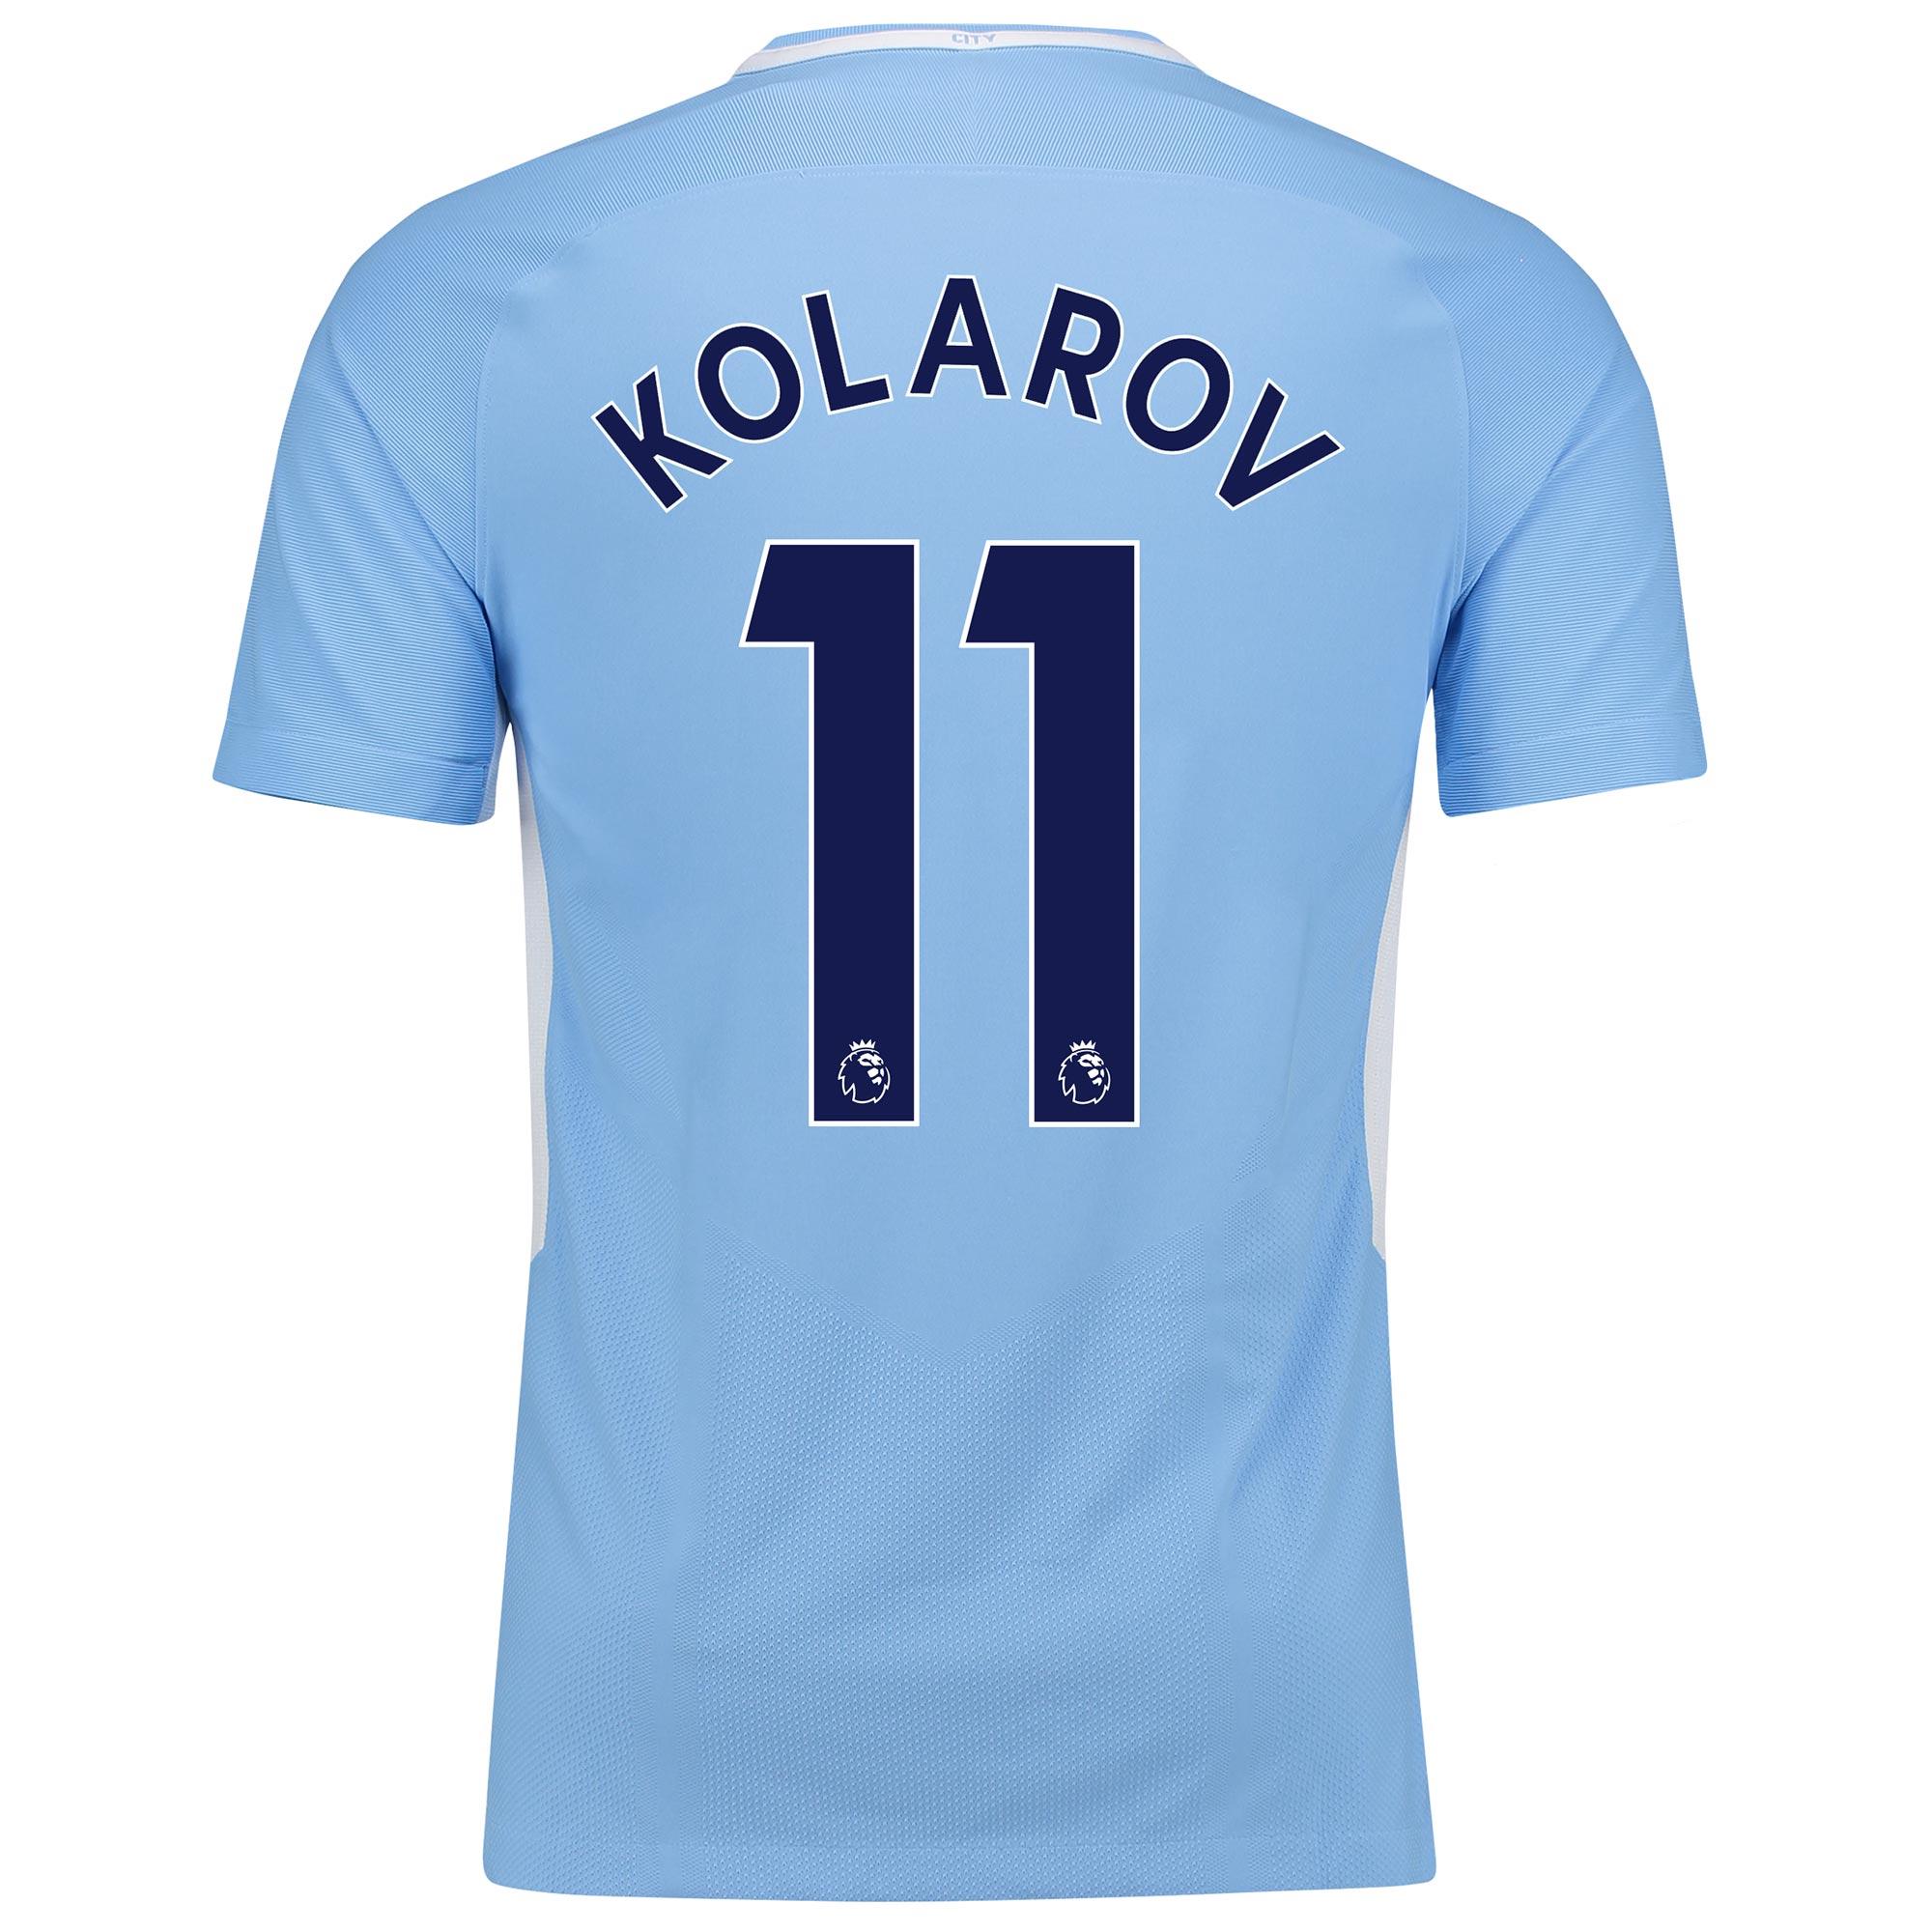 Manchester City Home Vapor Match Shirt 2017-18 with Kolarov 11 printin